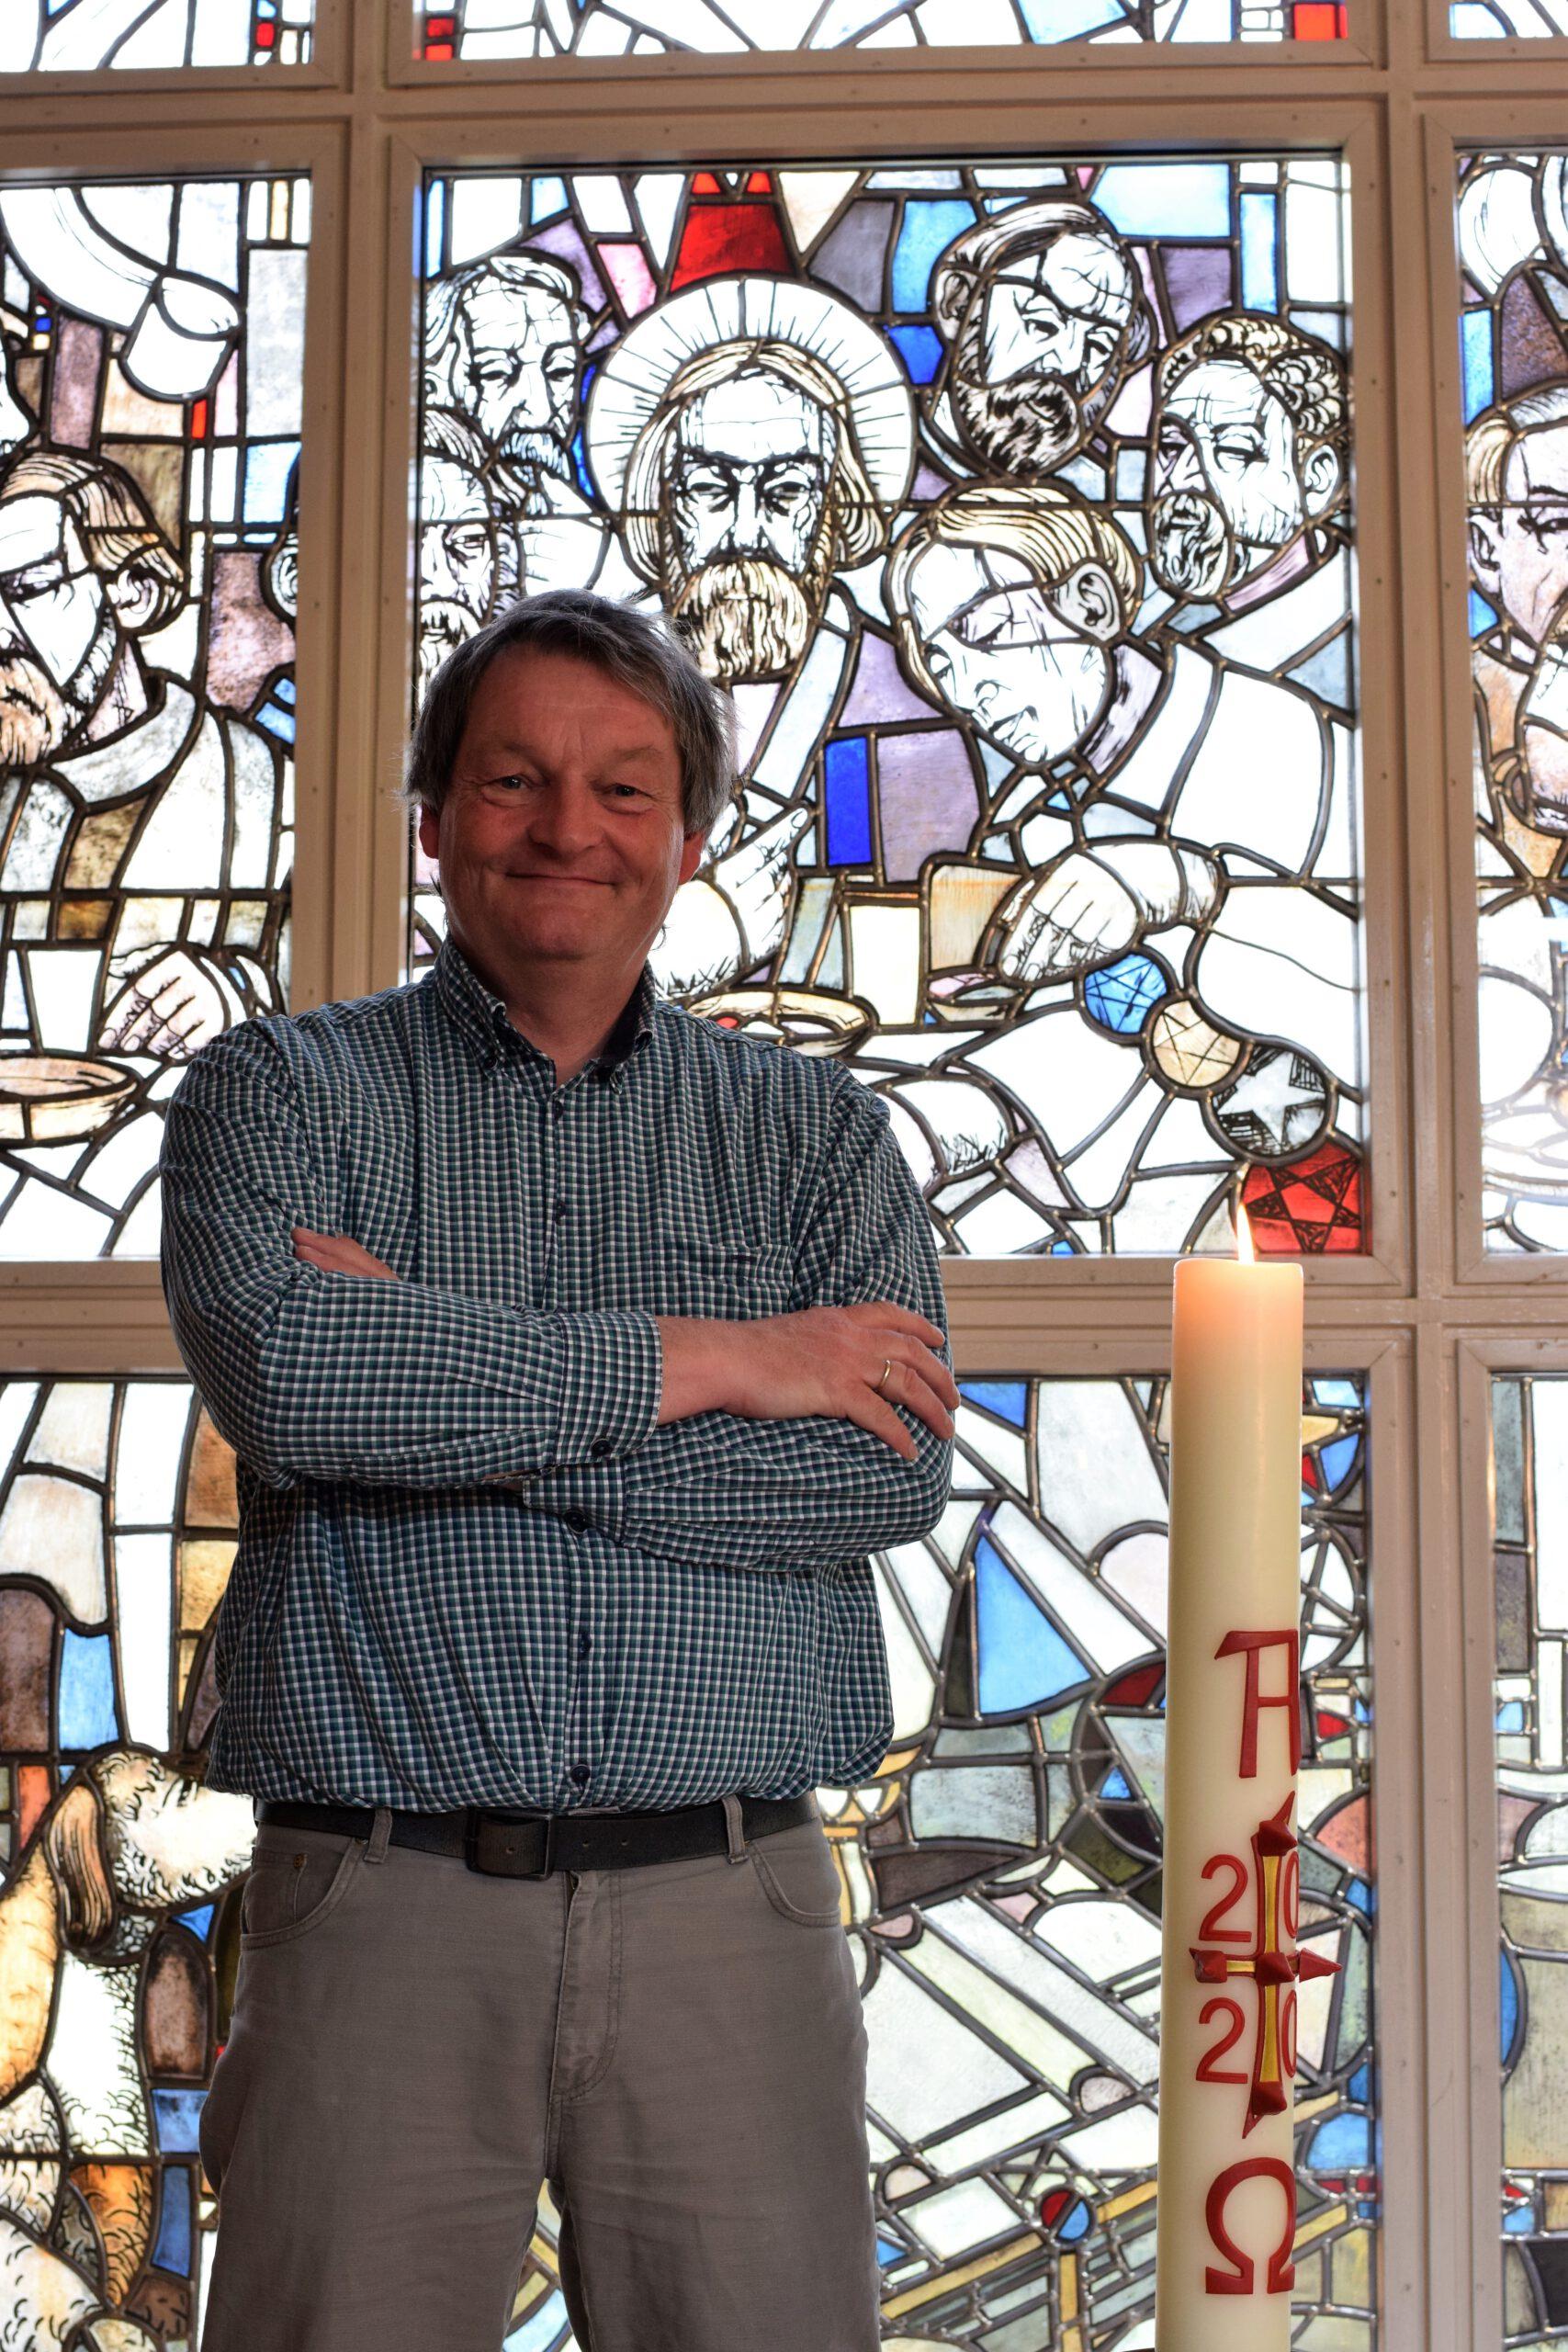 Pfarrer in Duisburg-Wanheimerort: Jürgen Muthmann